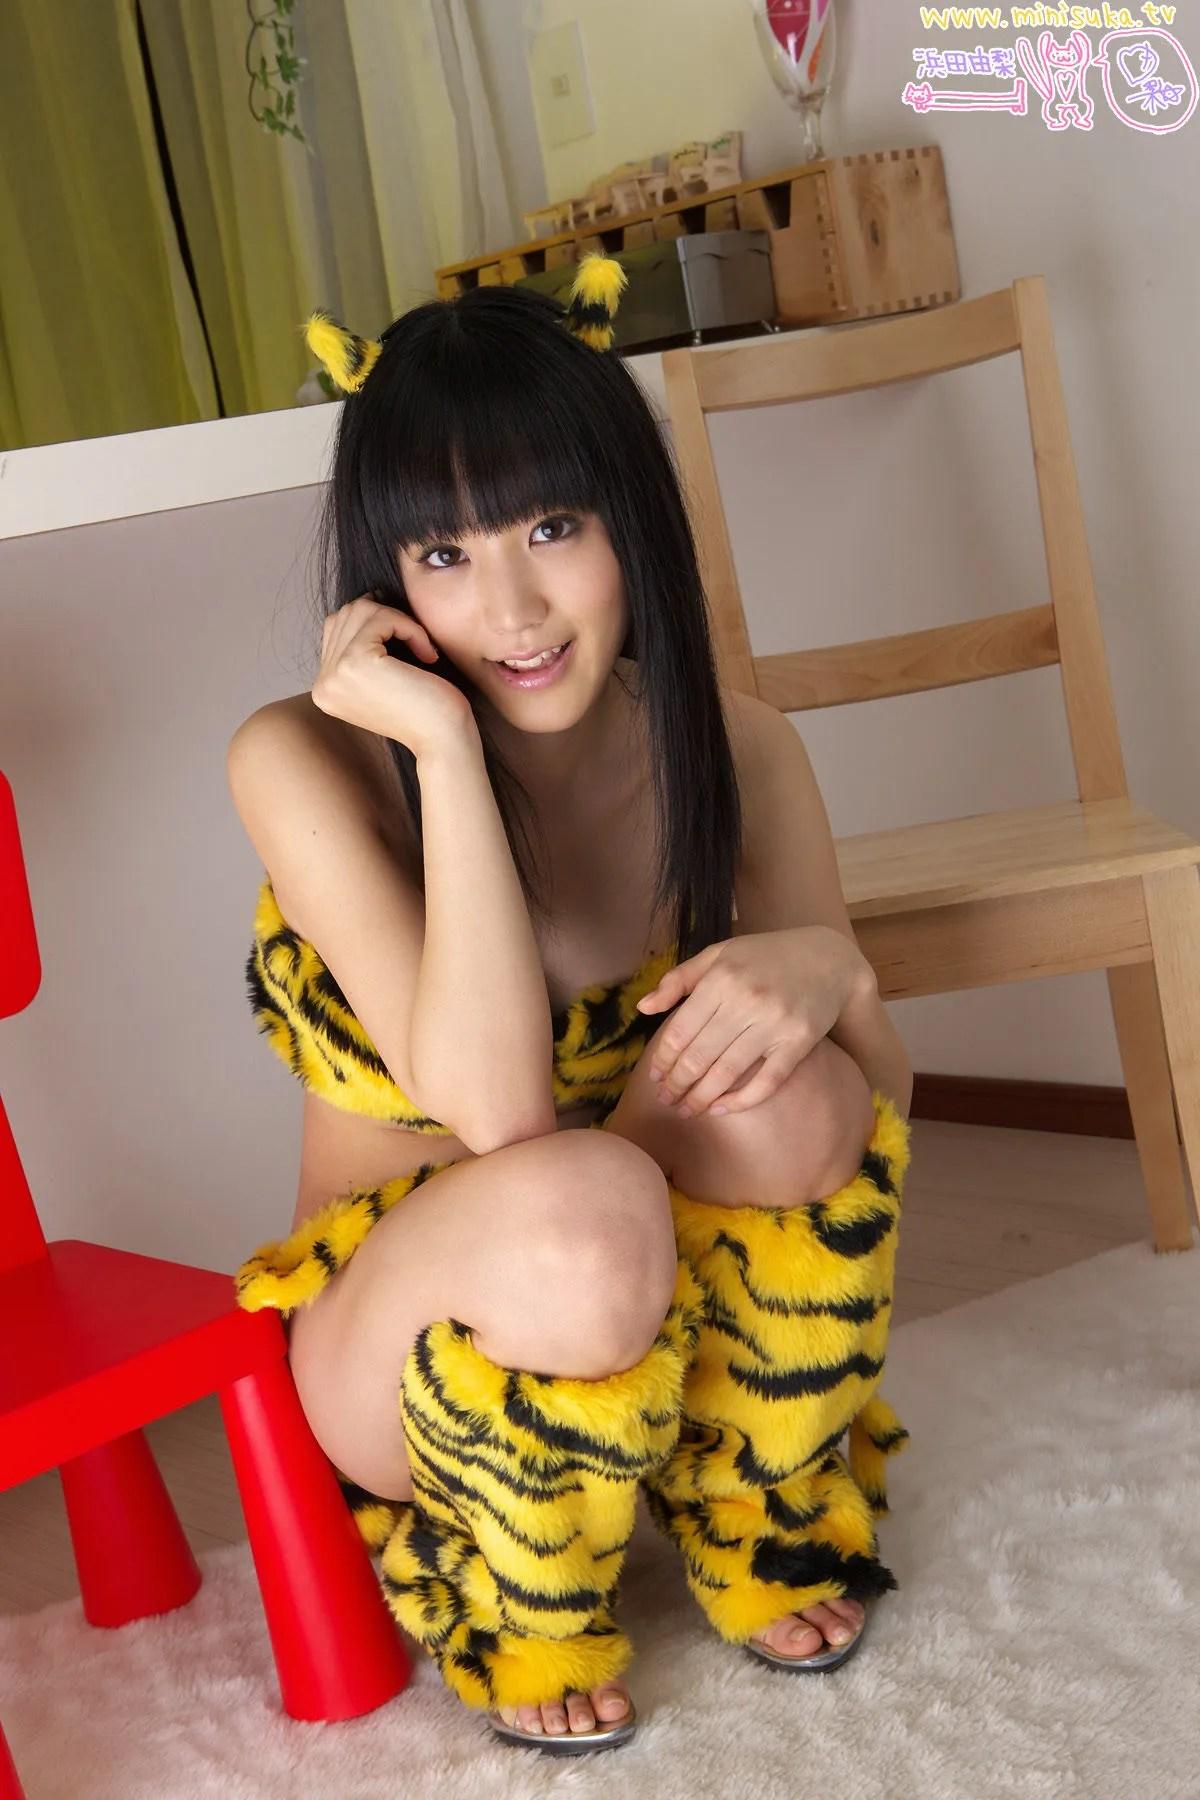 Yuri Hamada 浜田由梨 [Minisuka] Special Gallery STAGE1 4.5 写真集[37P]插图(9)